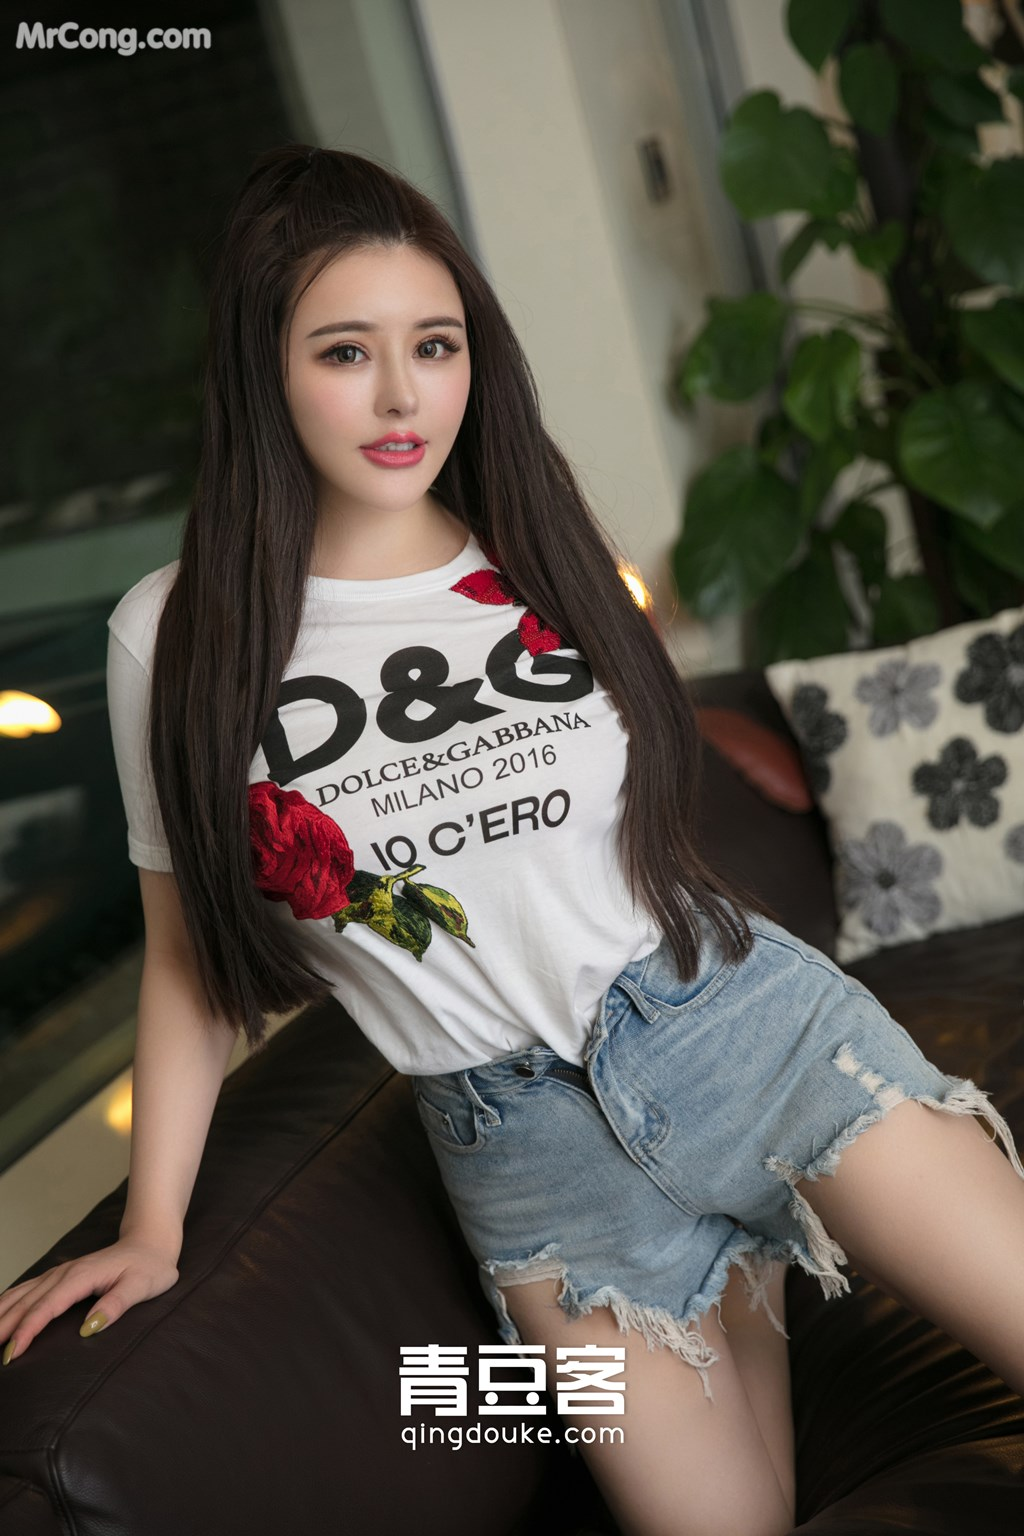 Image QingDouKe-2017-11-18-Jin-Baby-MrCong.com-003 in post QingDouKe 2017-11-18: Người mẫu Jin Baby (金baby) (49 ảnh)